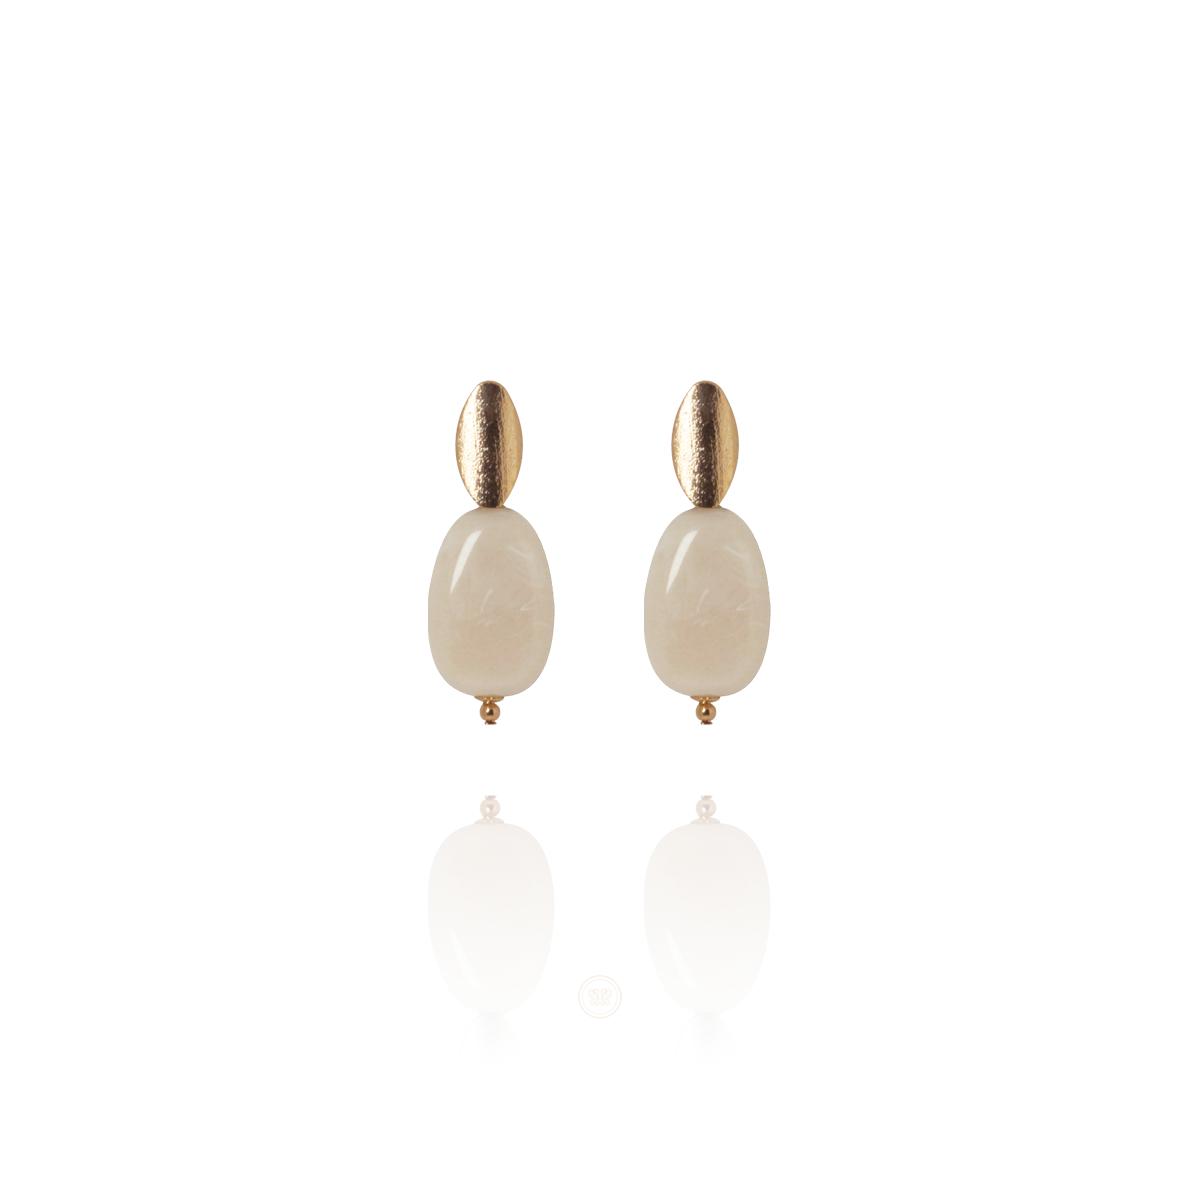 Brinco Barbara Strauss Semi Joia Edfu Em Resina Lalique Marfin, Rev. Em Ouro Amarelo 18K